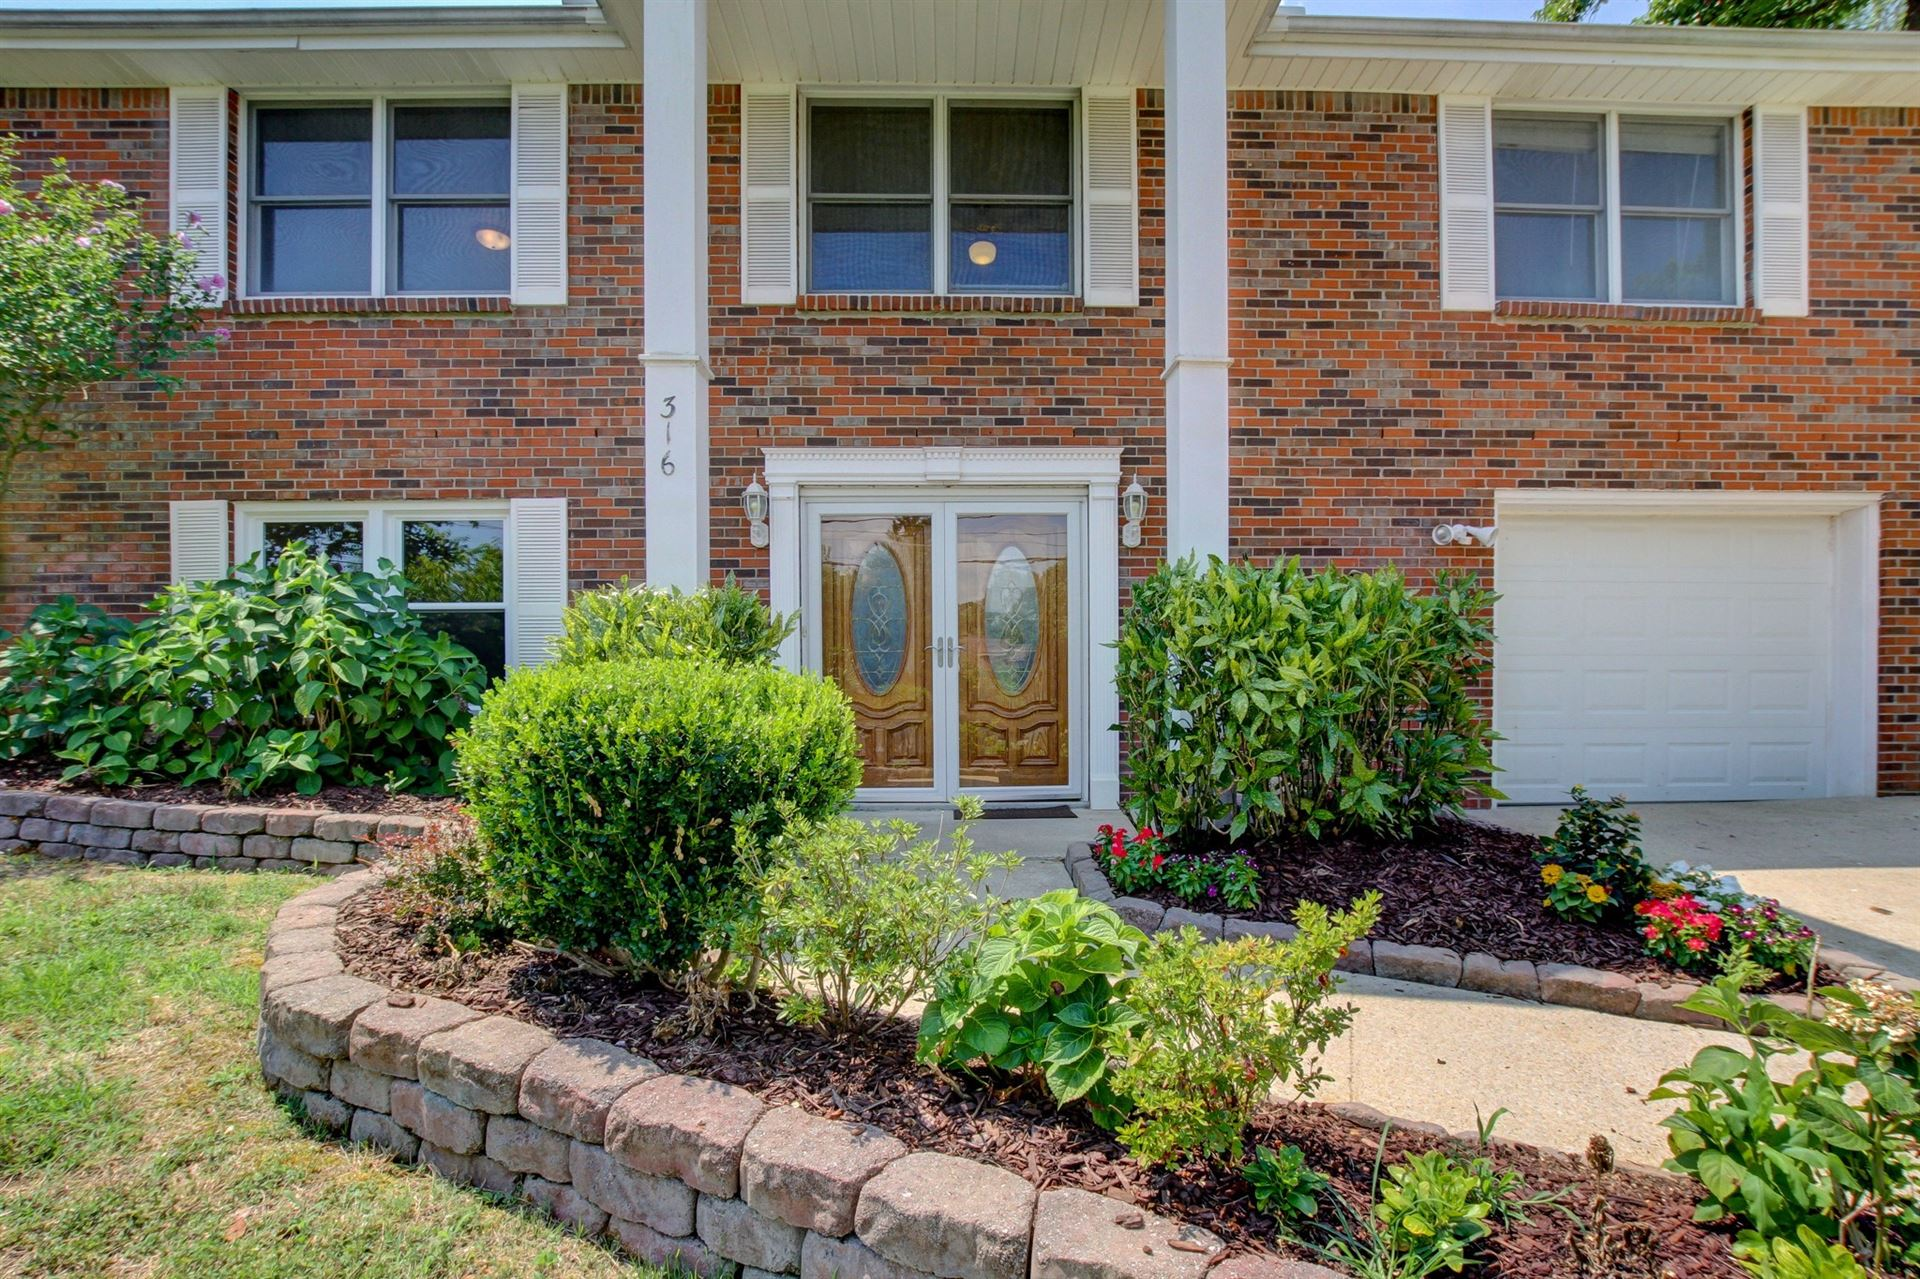 316 Meadowgreen Dr, Clarksville, TN 37040 - MLS#: 2172342